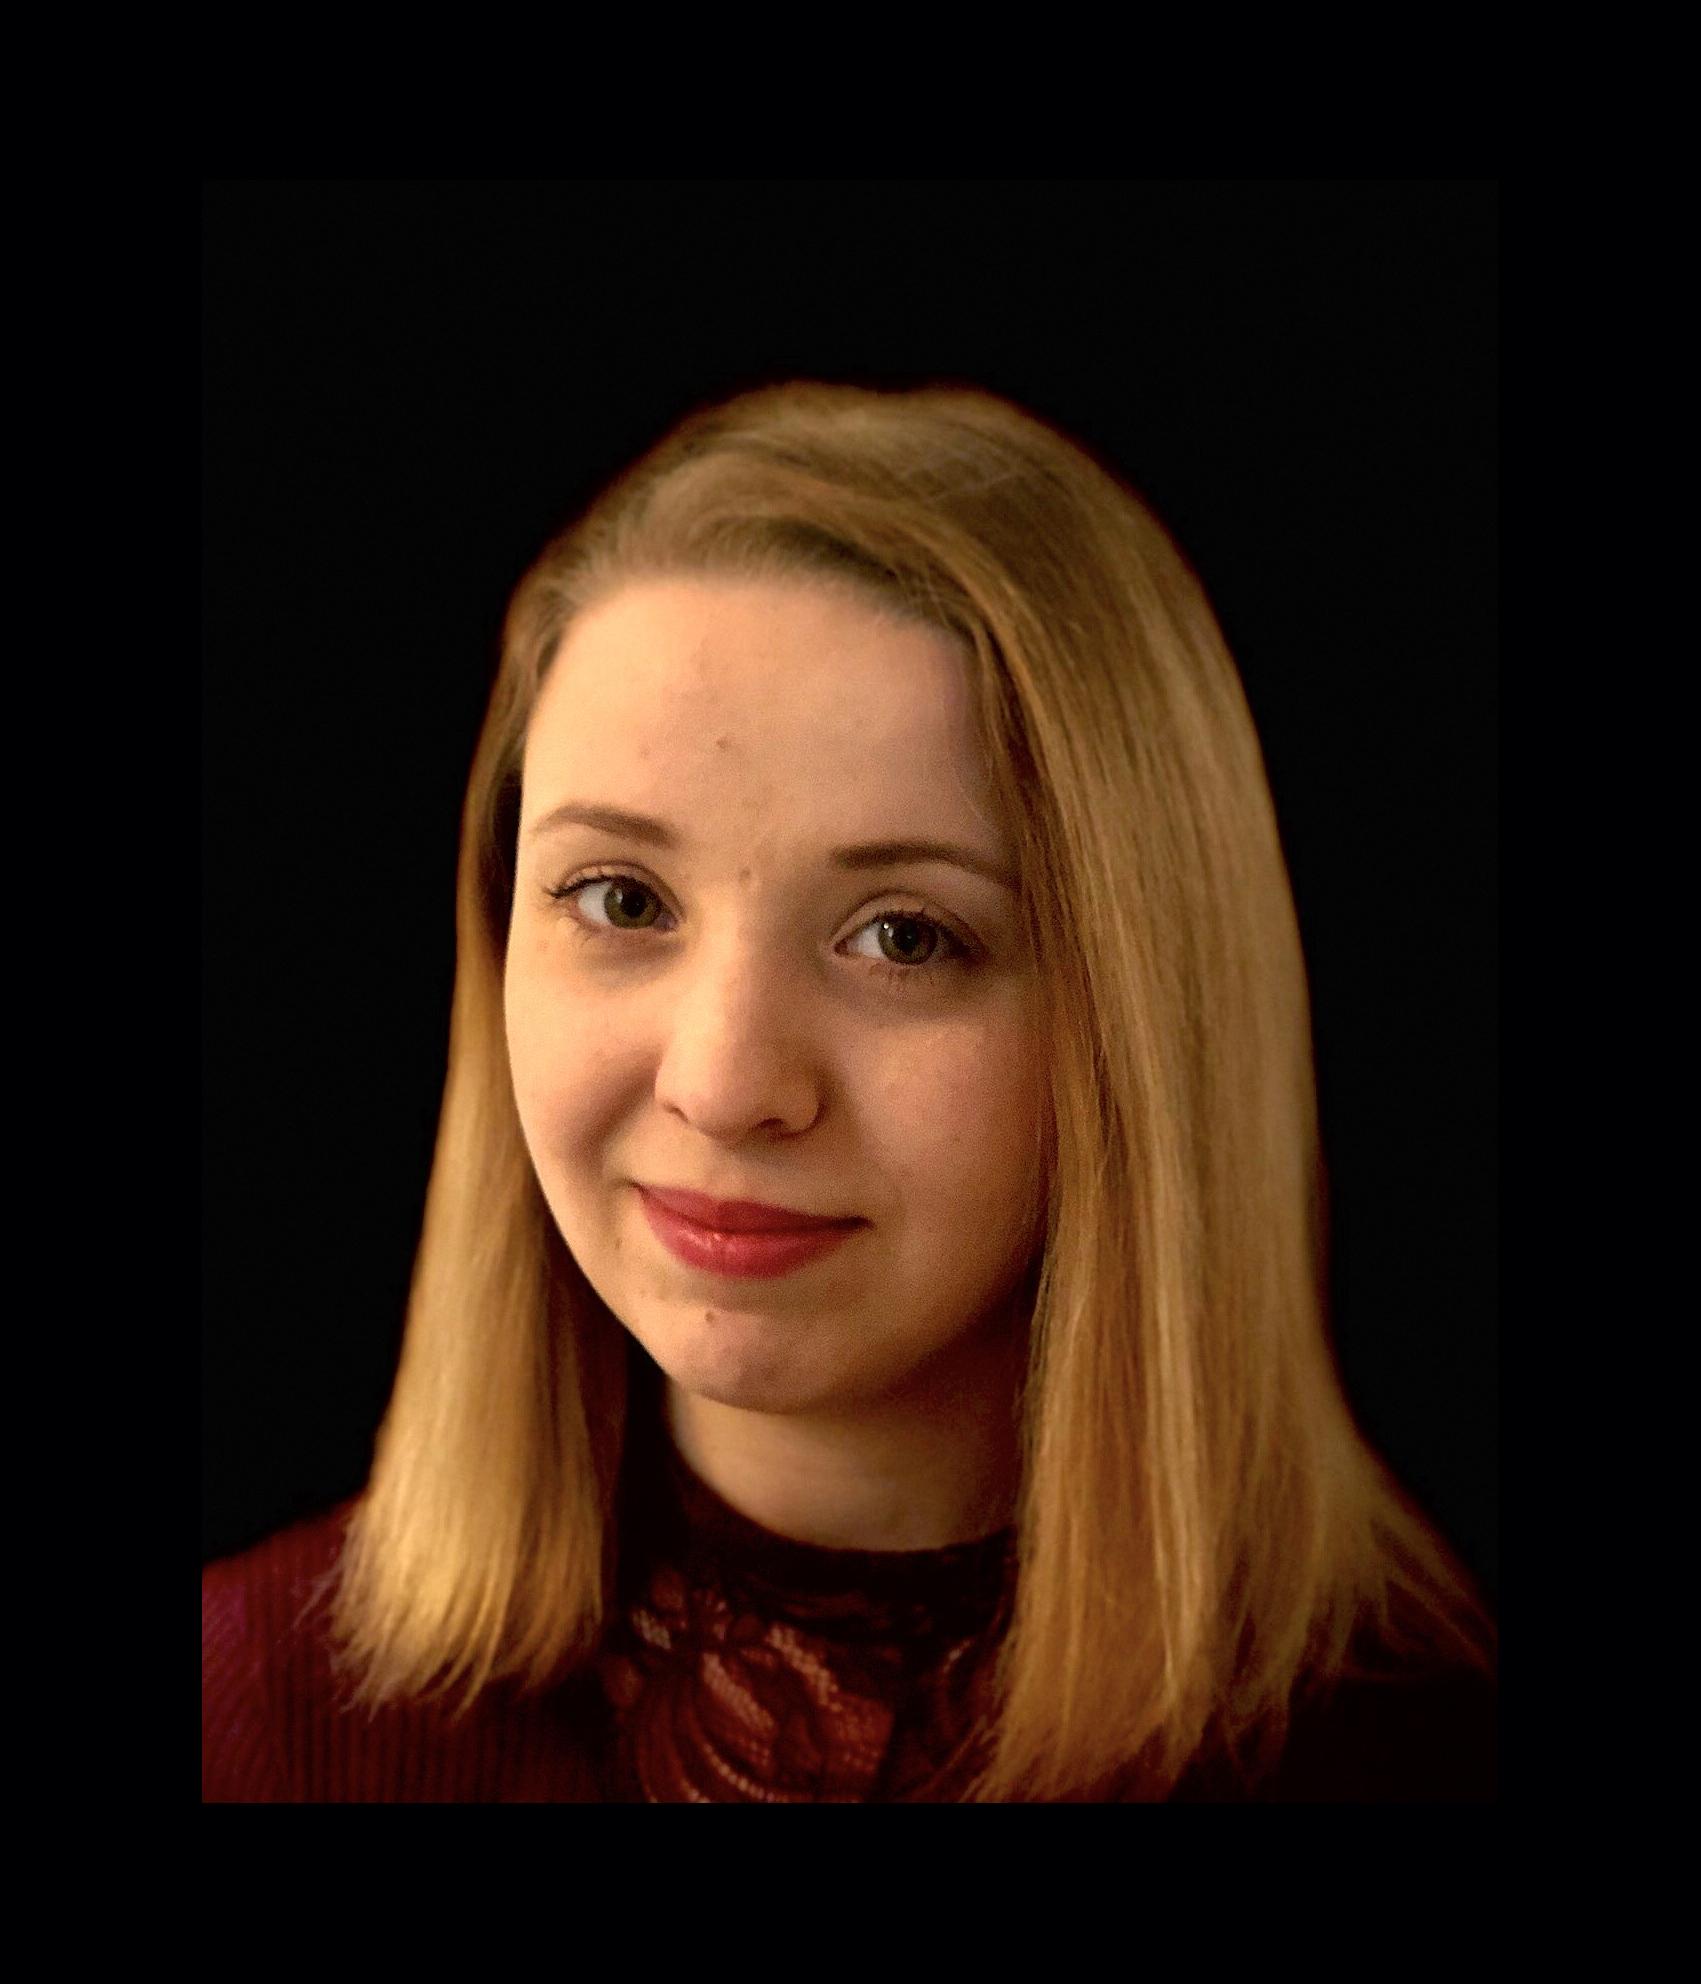 Elodie Anchéta